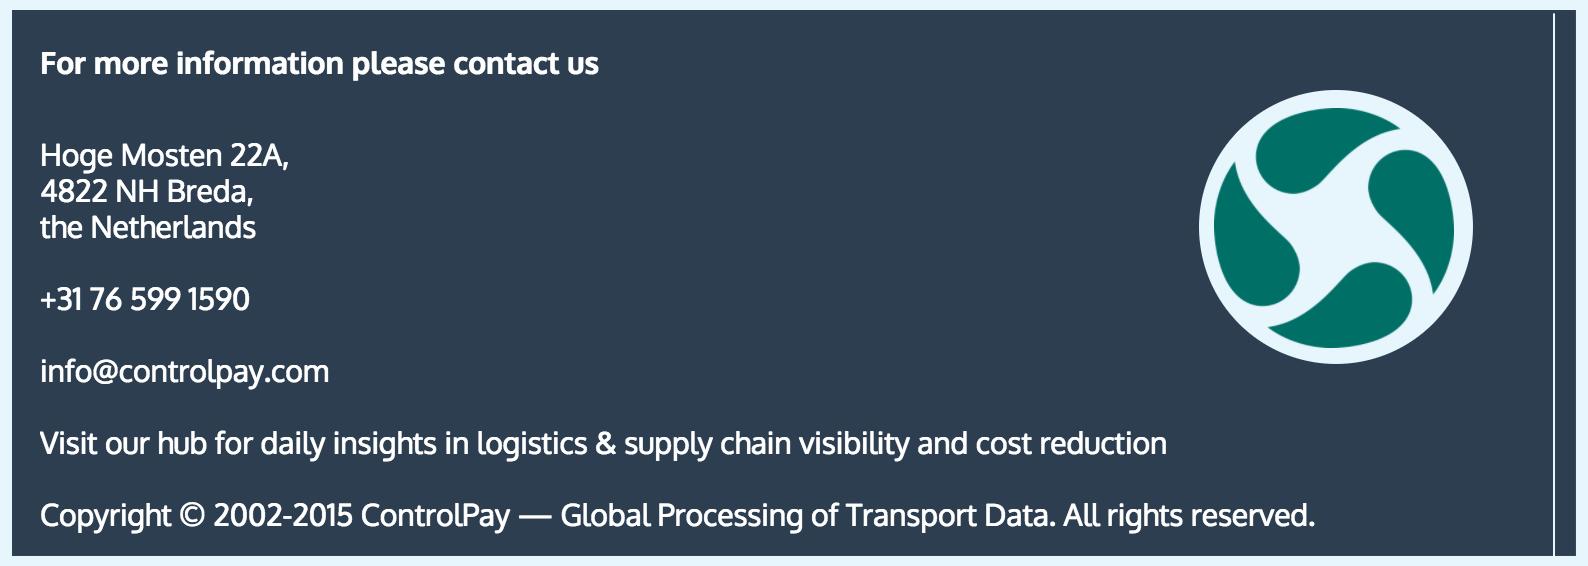 Controlpay. Freight Audit: International manufacturer case study